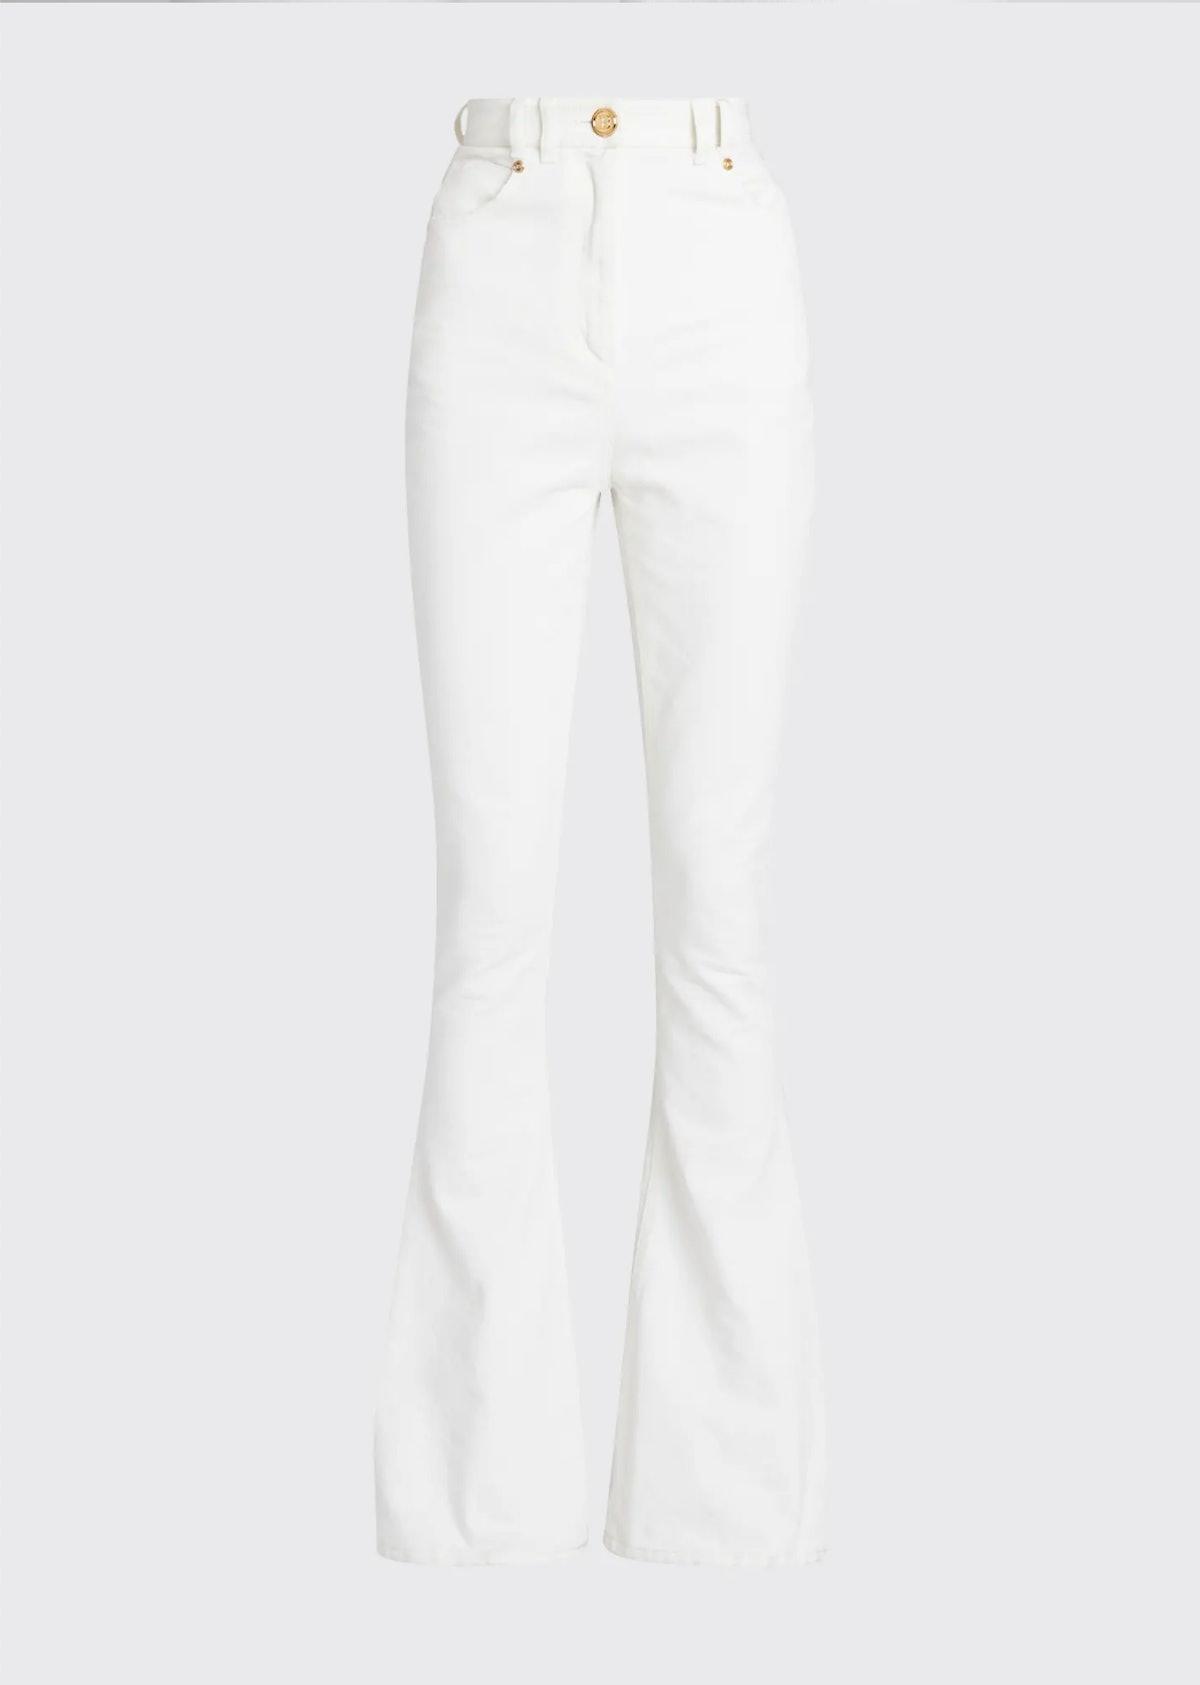 Balmain's high-waisted bootcut jeans in white.